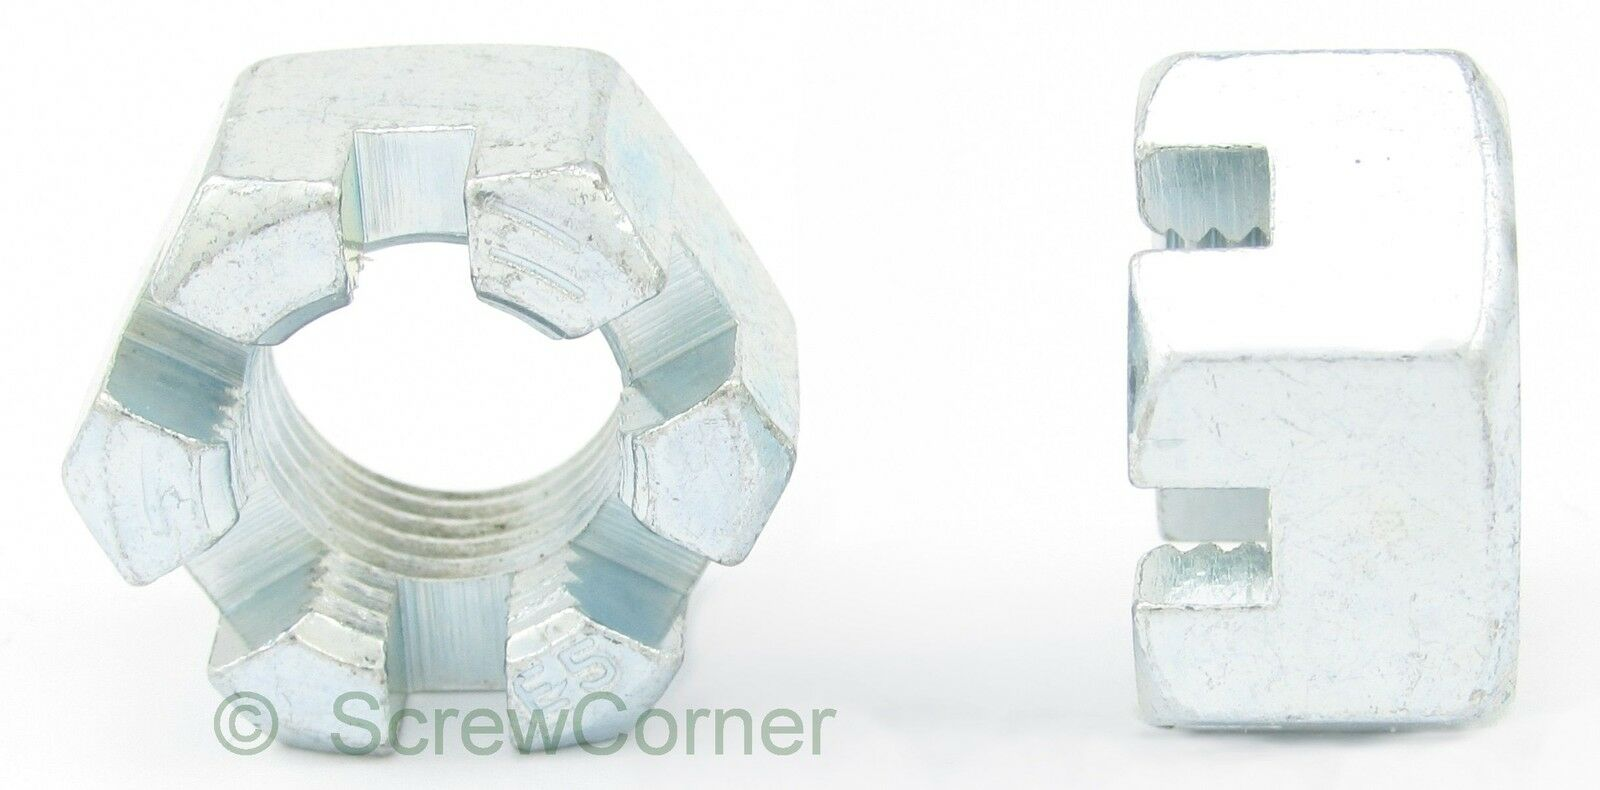 Kronenmutter 3 4-16 UNF Grade 5 verzinkt - Slotted Nut 3 4-16 UNF Grd.5 Zp